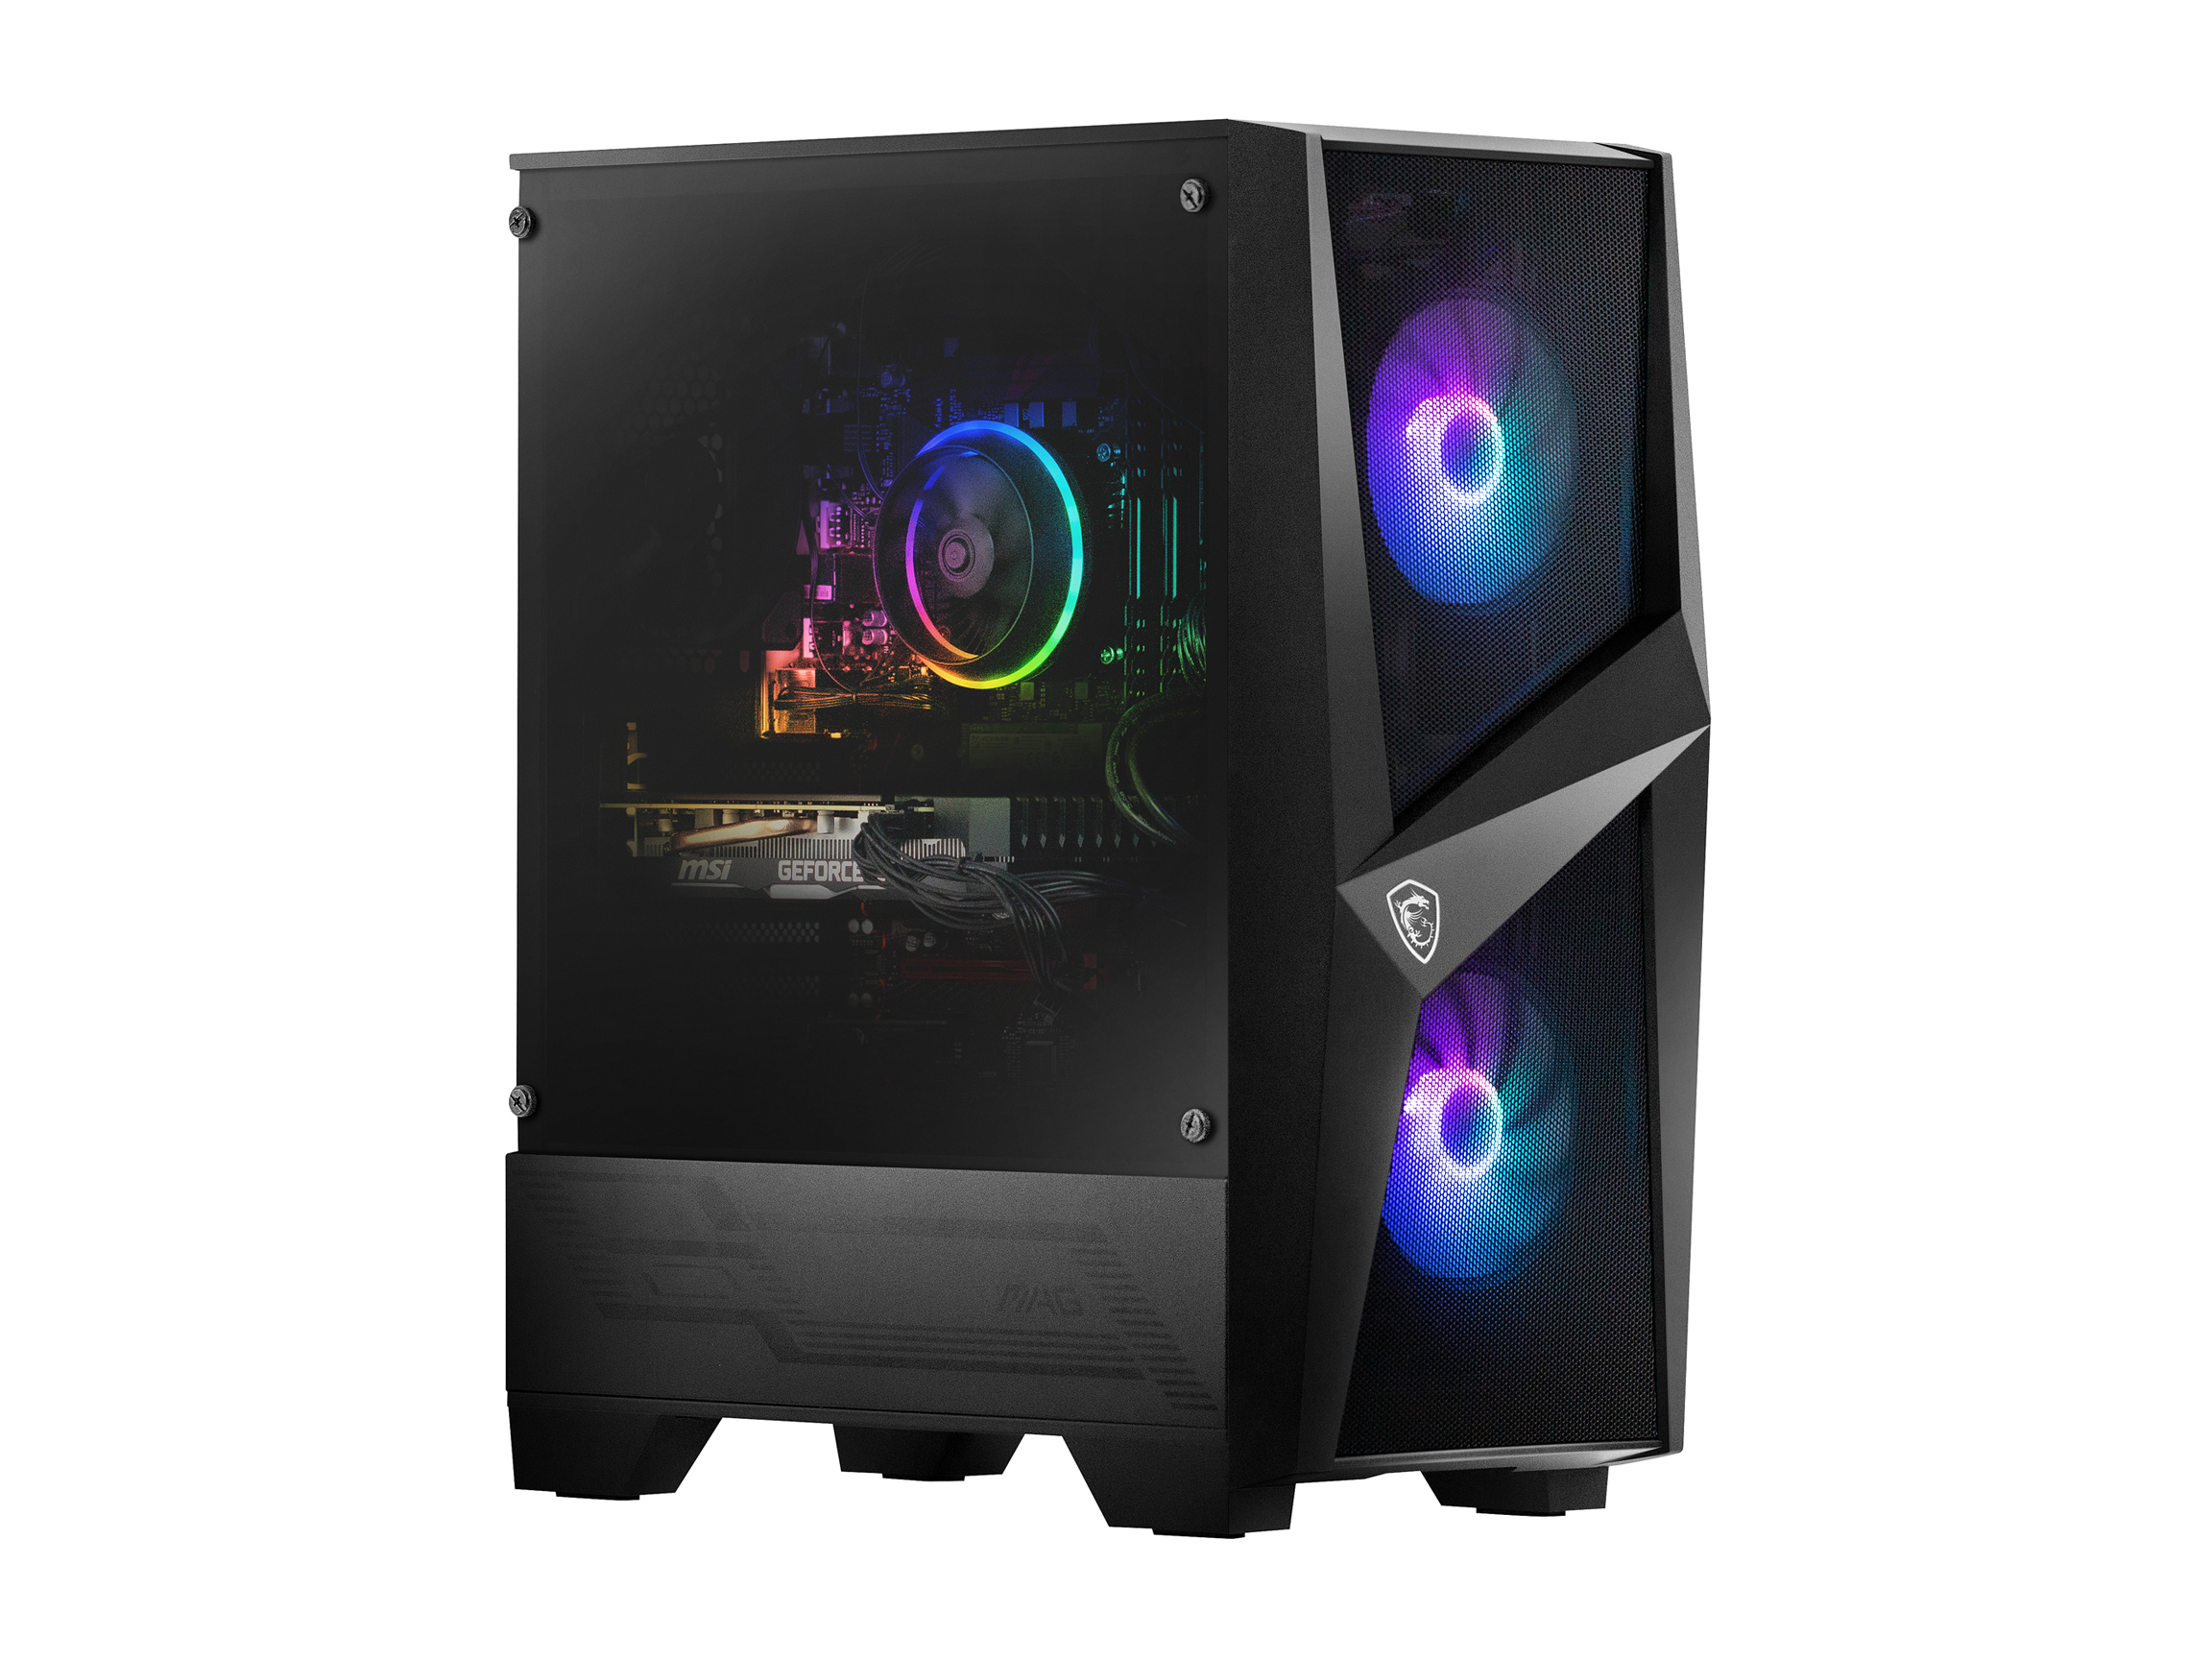 MSI Codex R Intel Core i7-10700F NVIDIA GeForce RTX 2060 16 GB DDR4 1TB HDD 512GB SSD Win 10 Home Gaming Desktop, 10SC-005CA, Keyboard & Mouse